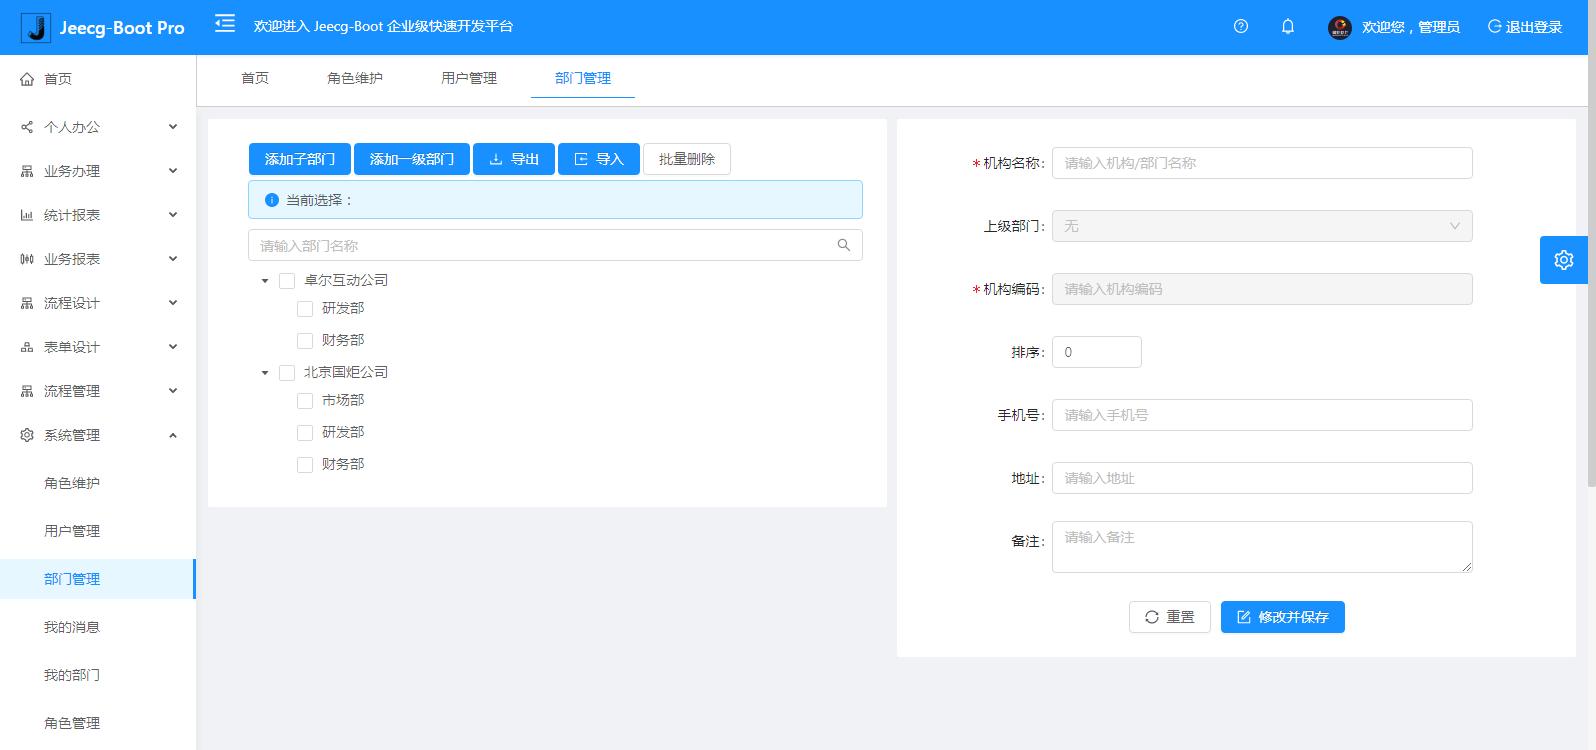 JeecgBoot 2.4.3版本发布,企业级低代码平台(图9)